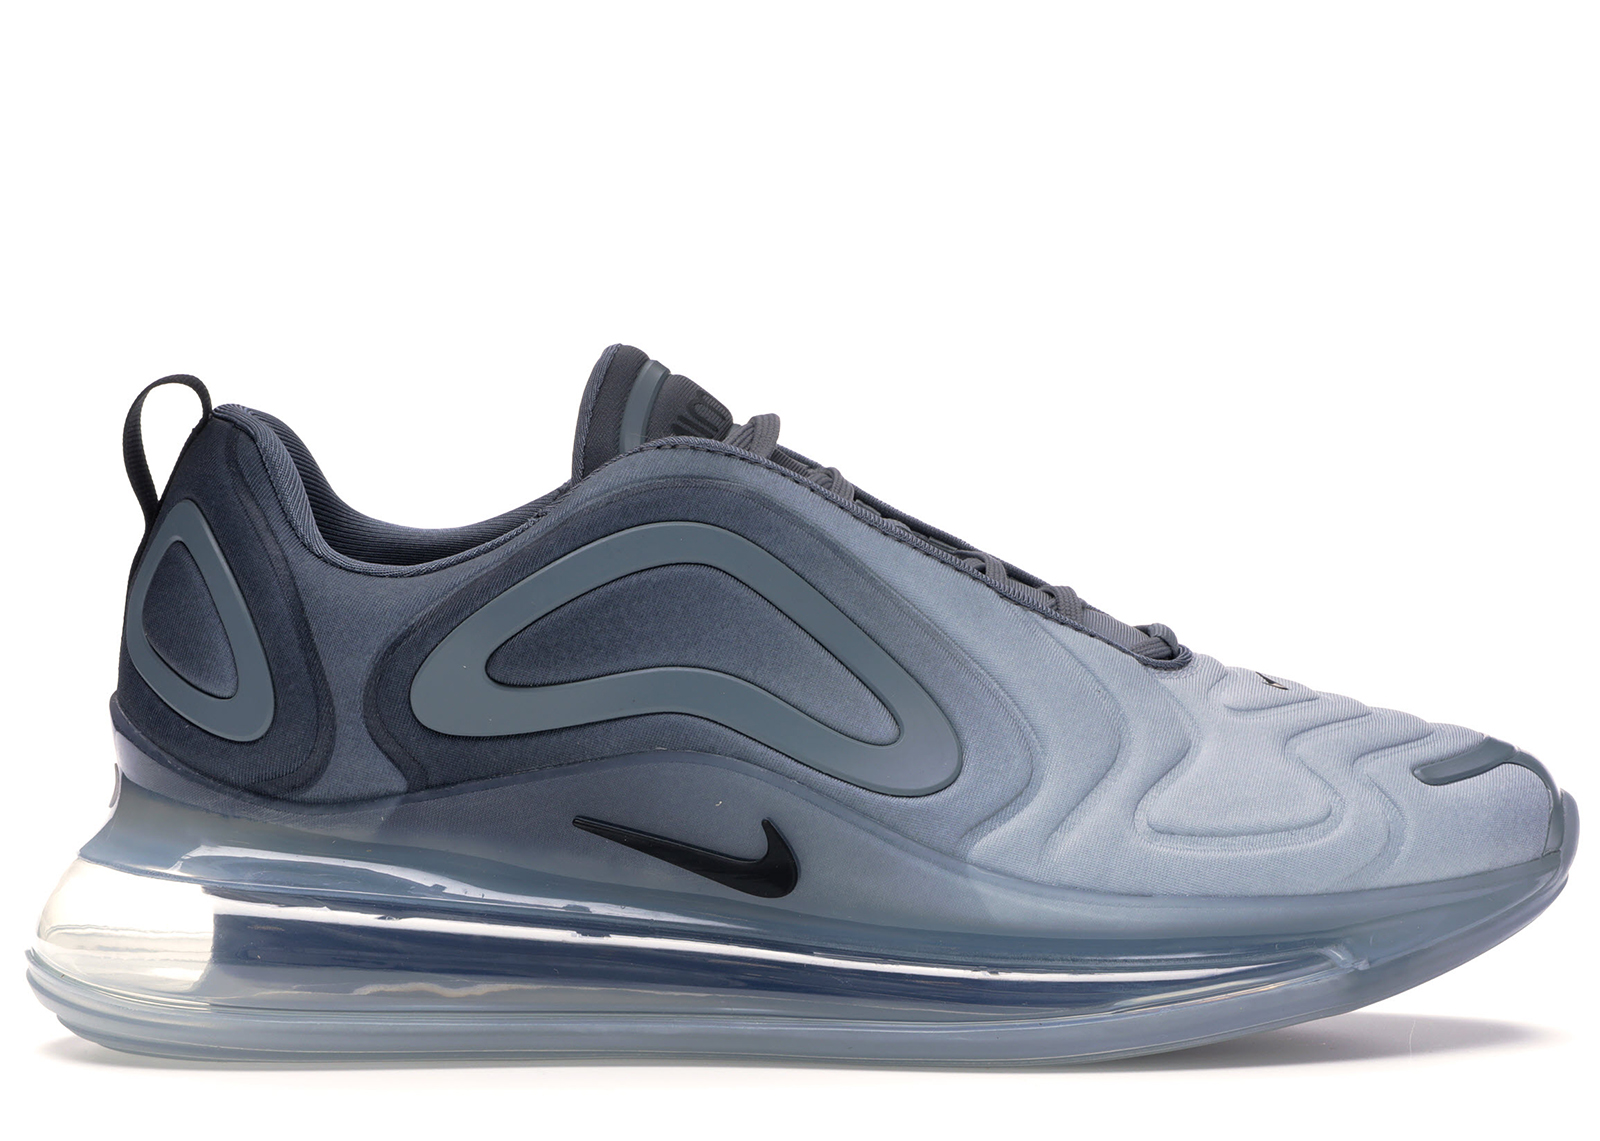 Nike Air Max 720 Carbon Grey - AO2924-002